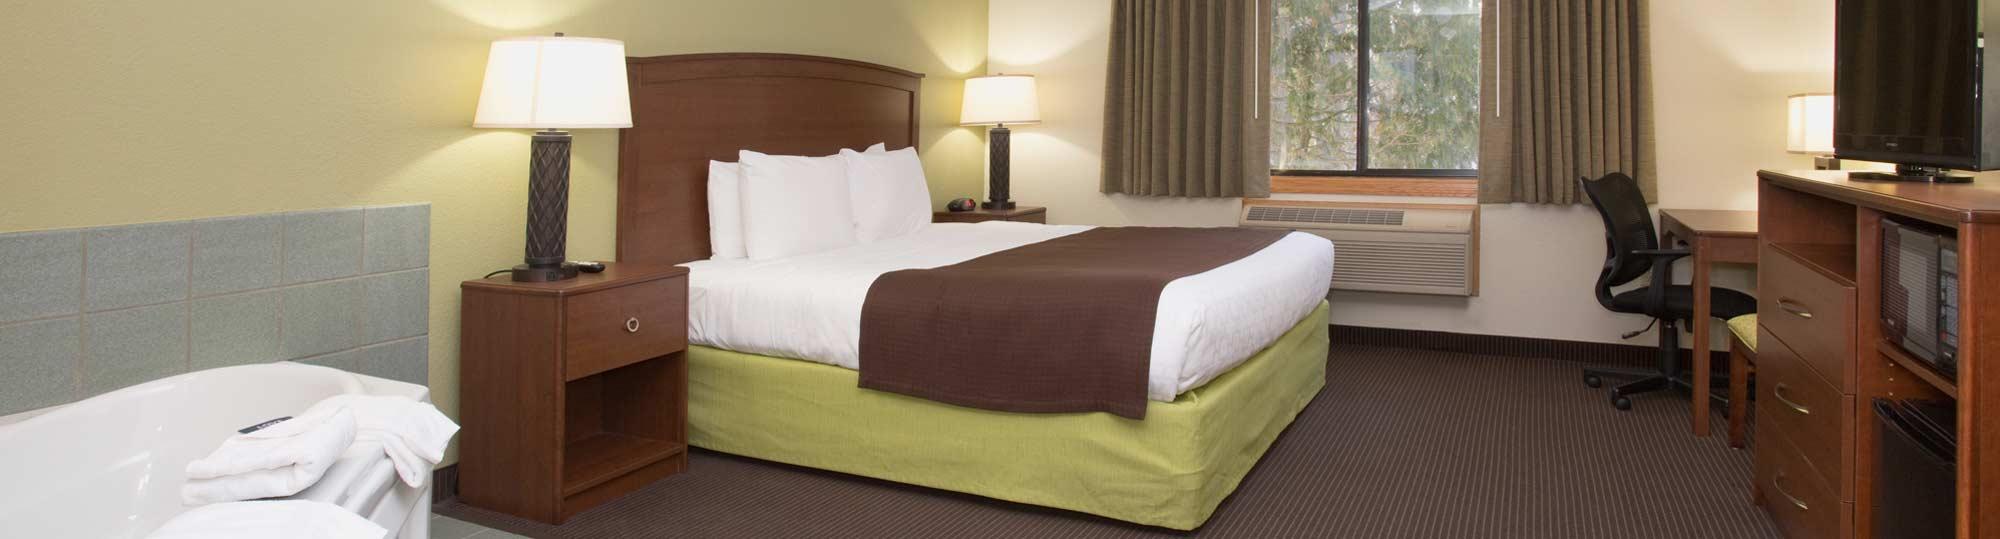 Cobblestone Hotel and Suites Wisconsin Rapids